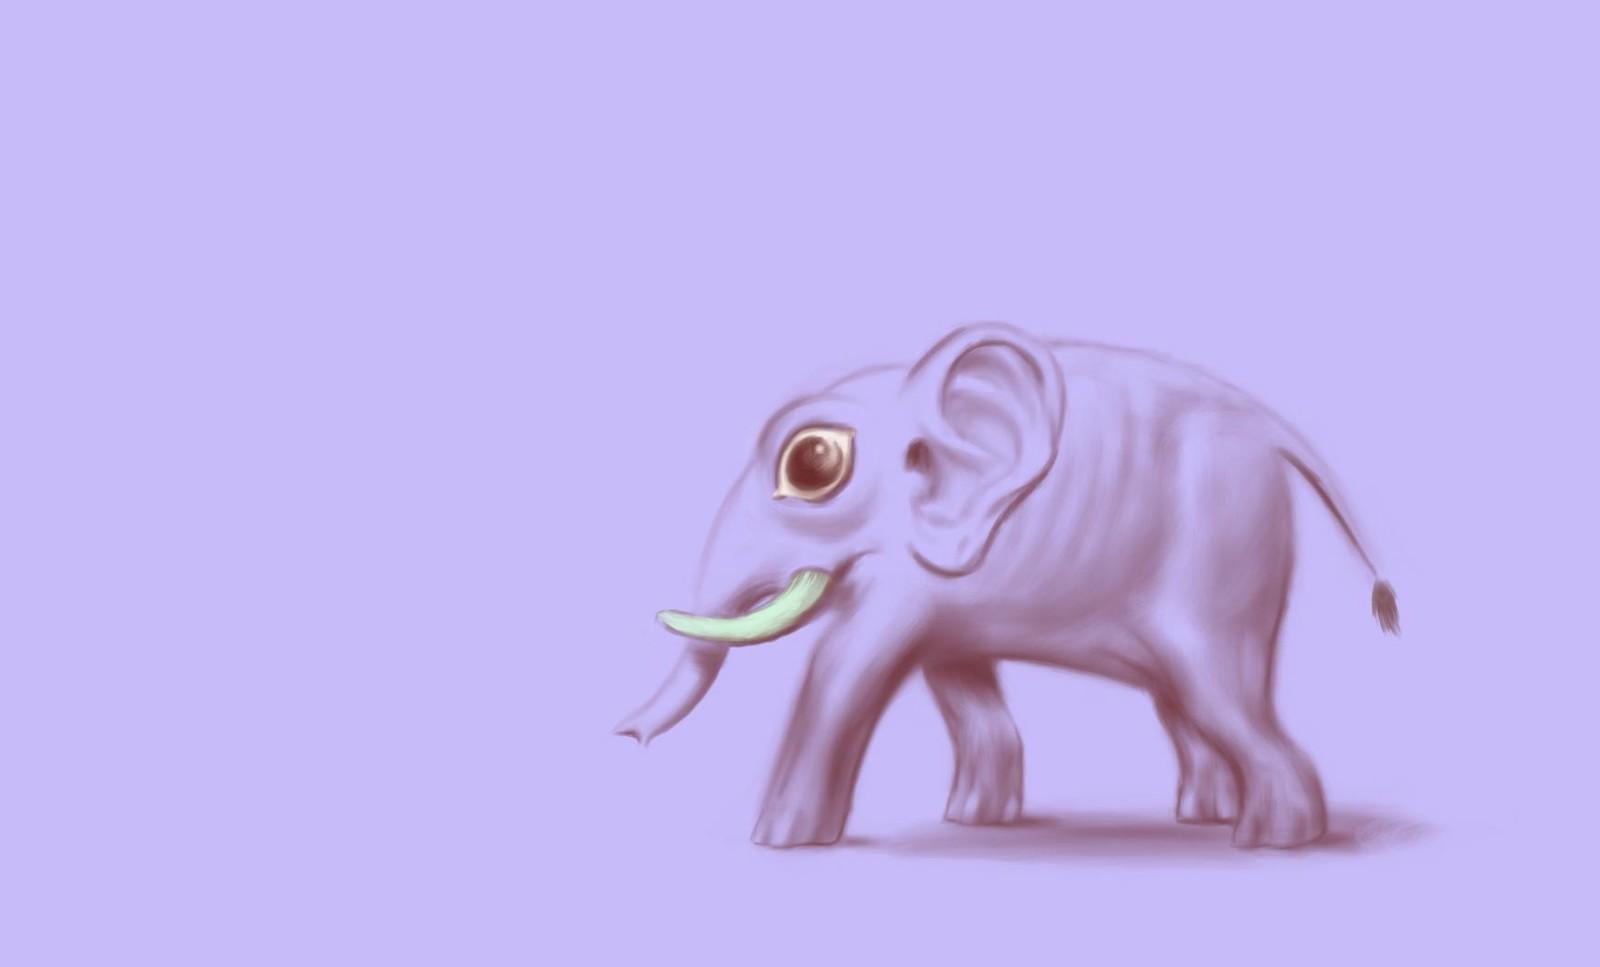 An attentive elephant